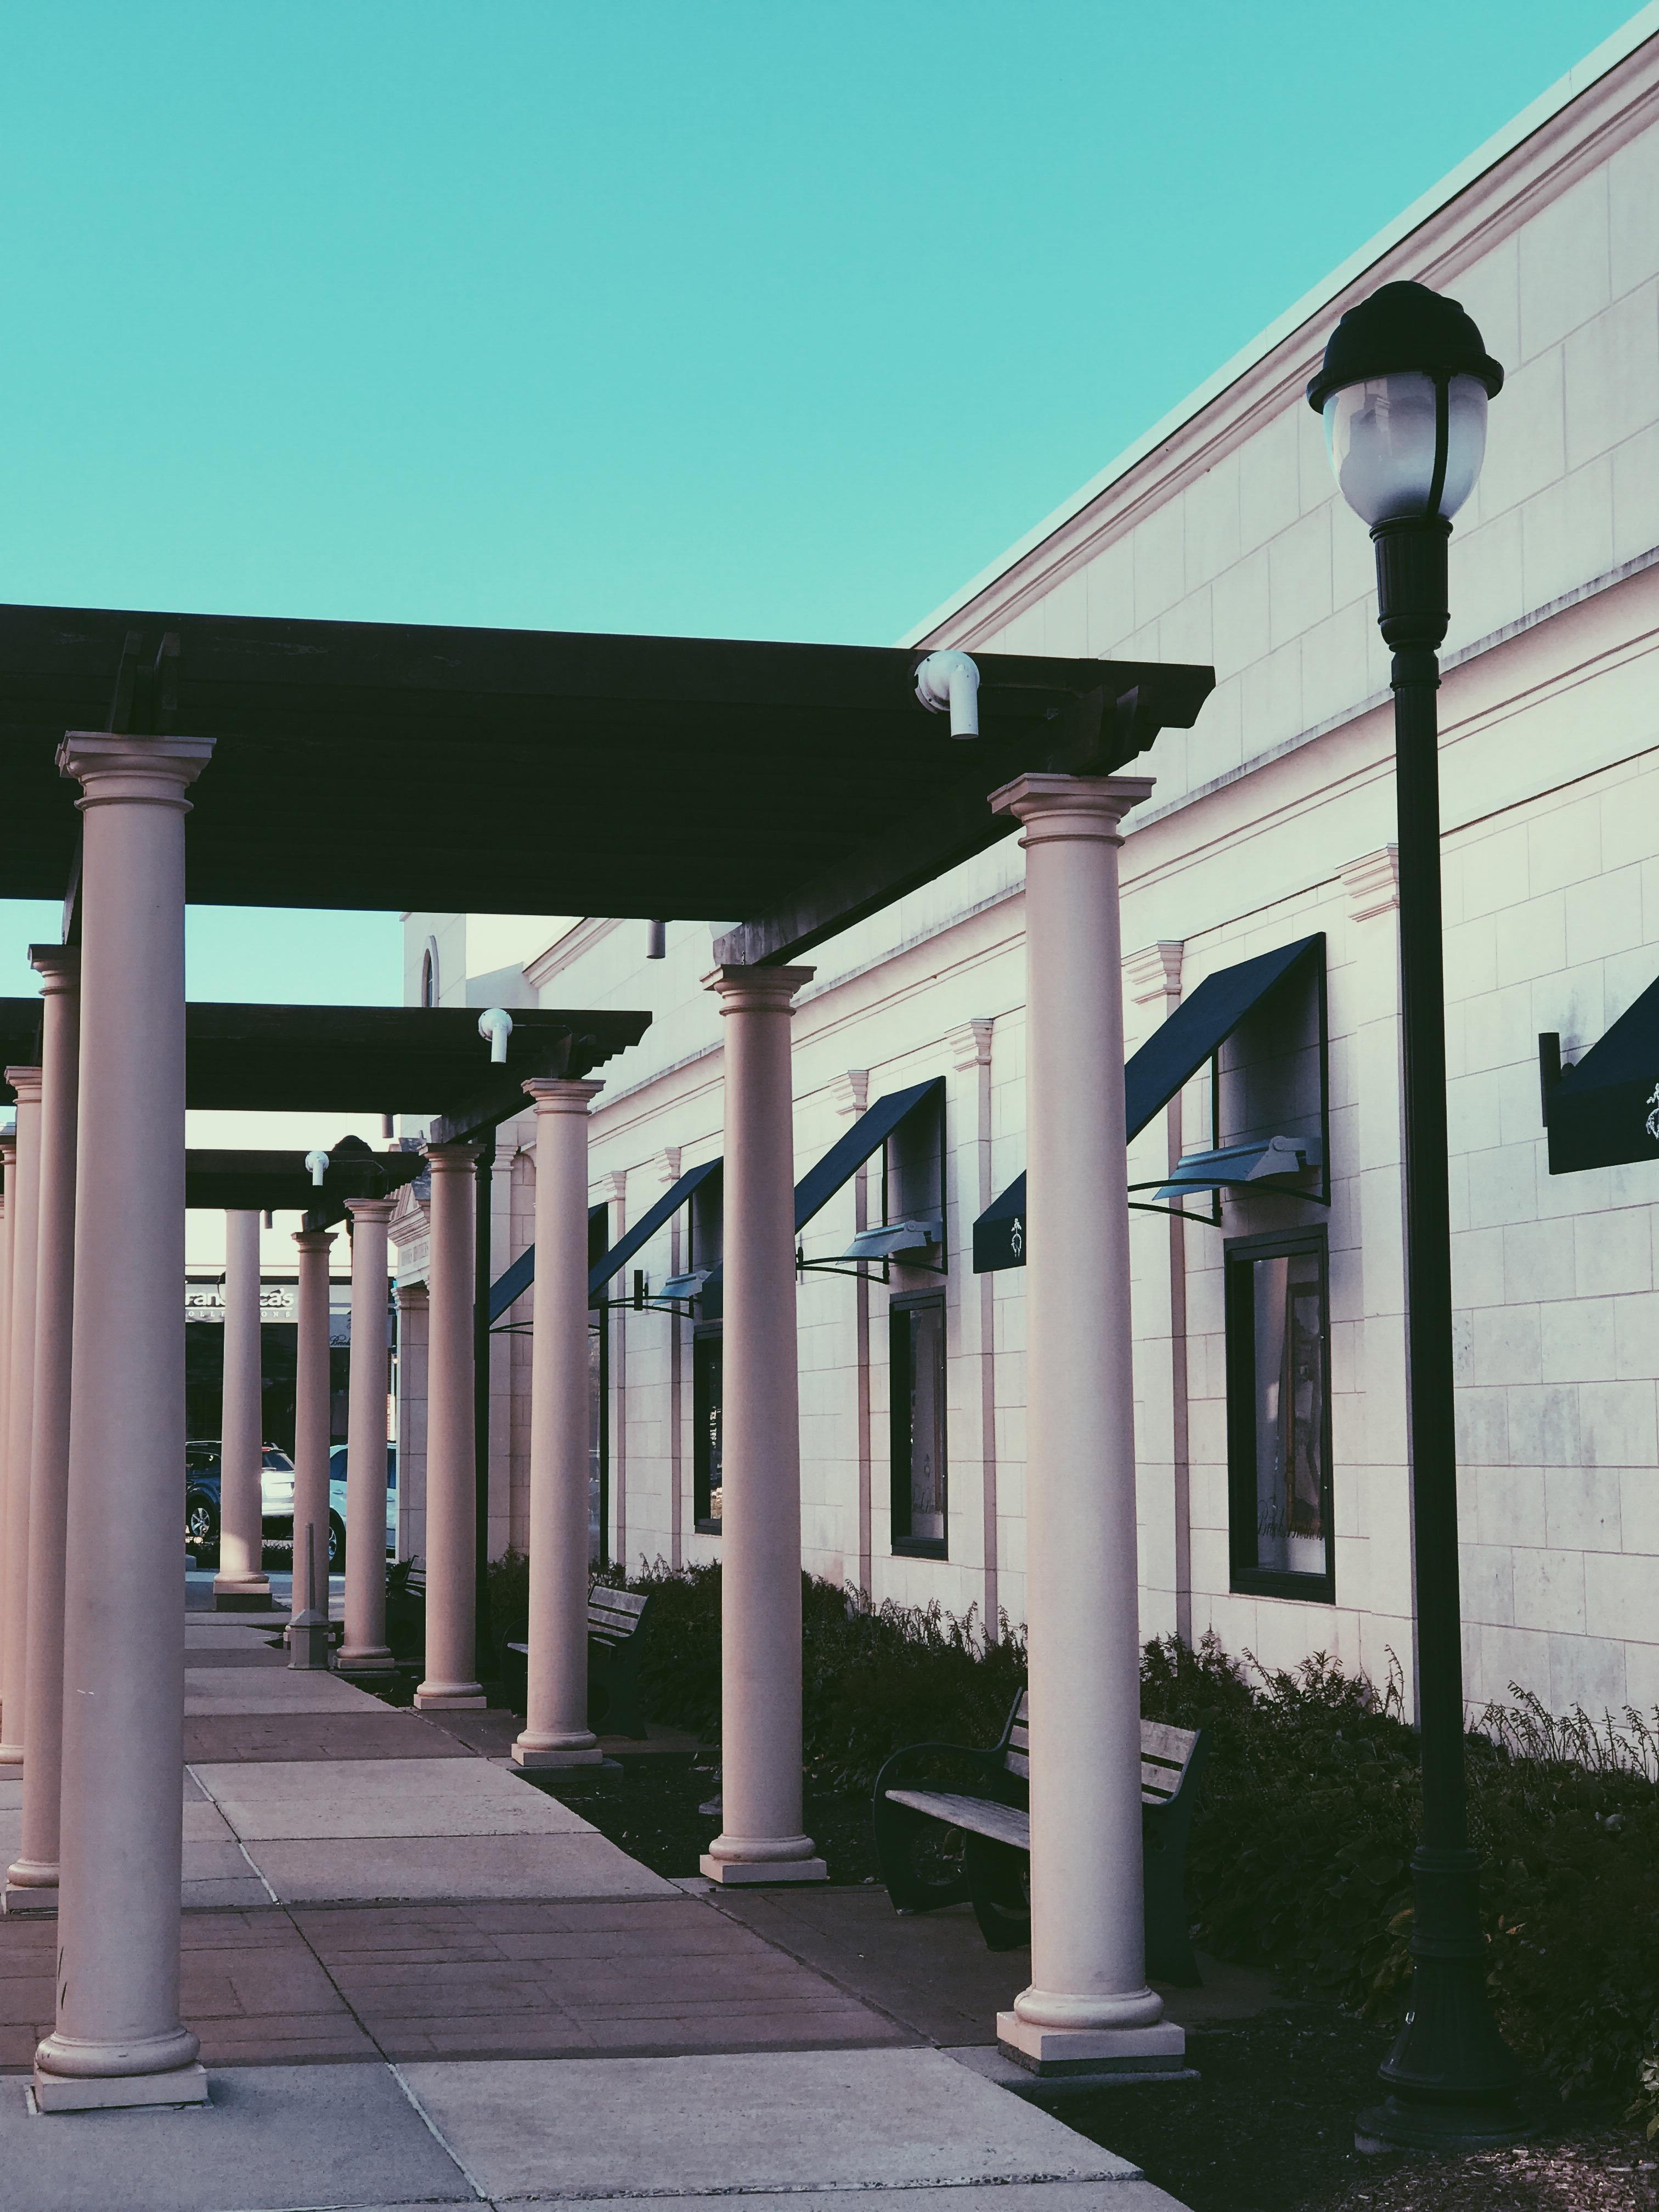 Light Post Near Pillars